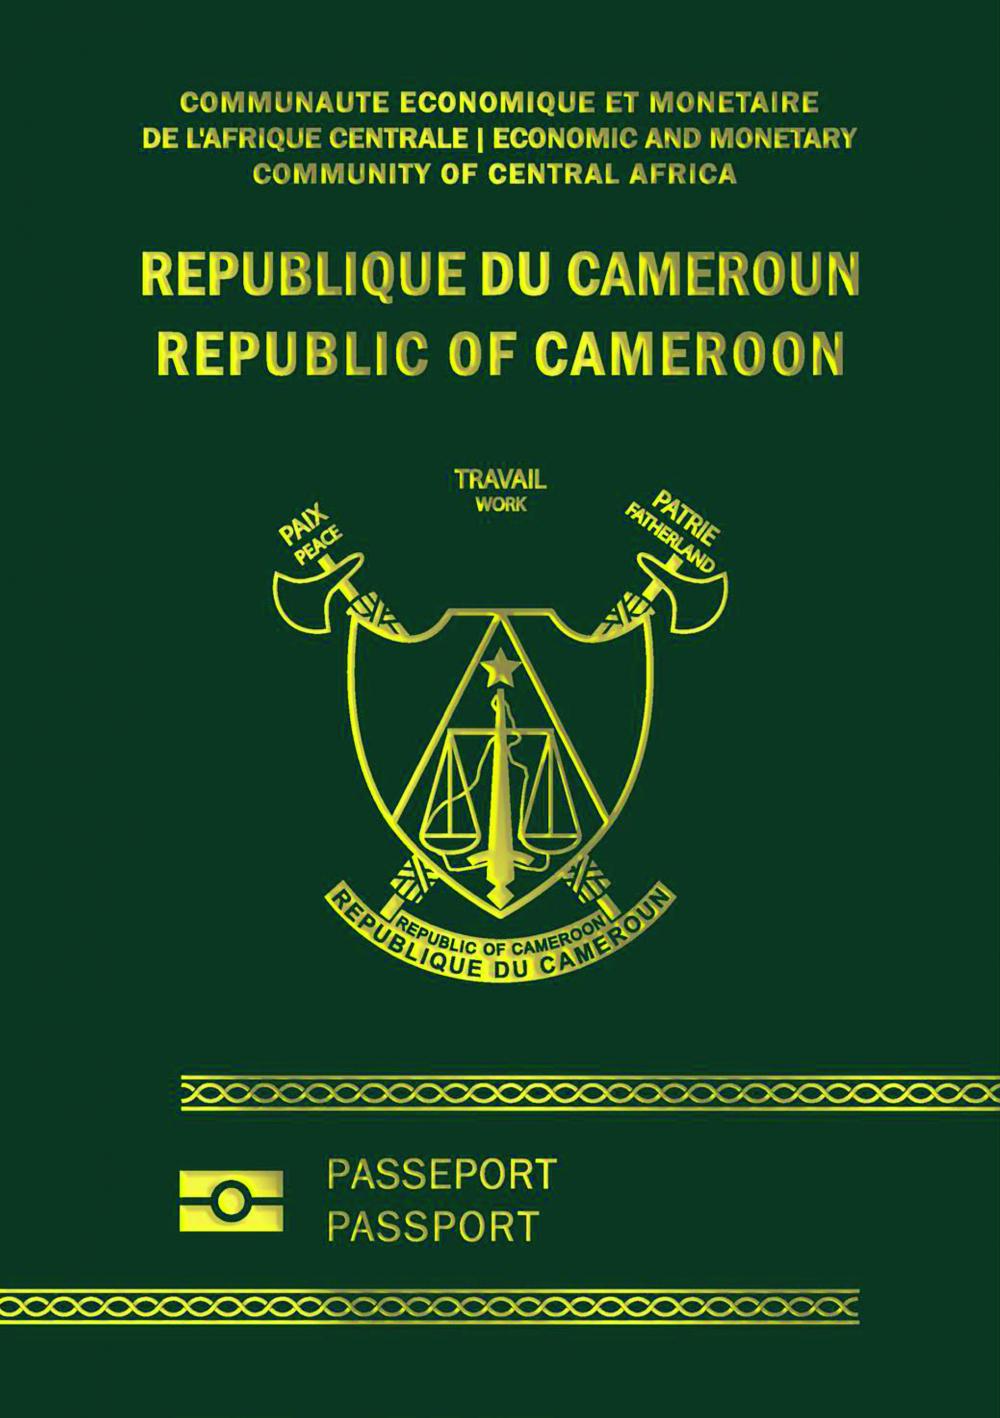 Biometric Passport  : New Version From July 1st